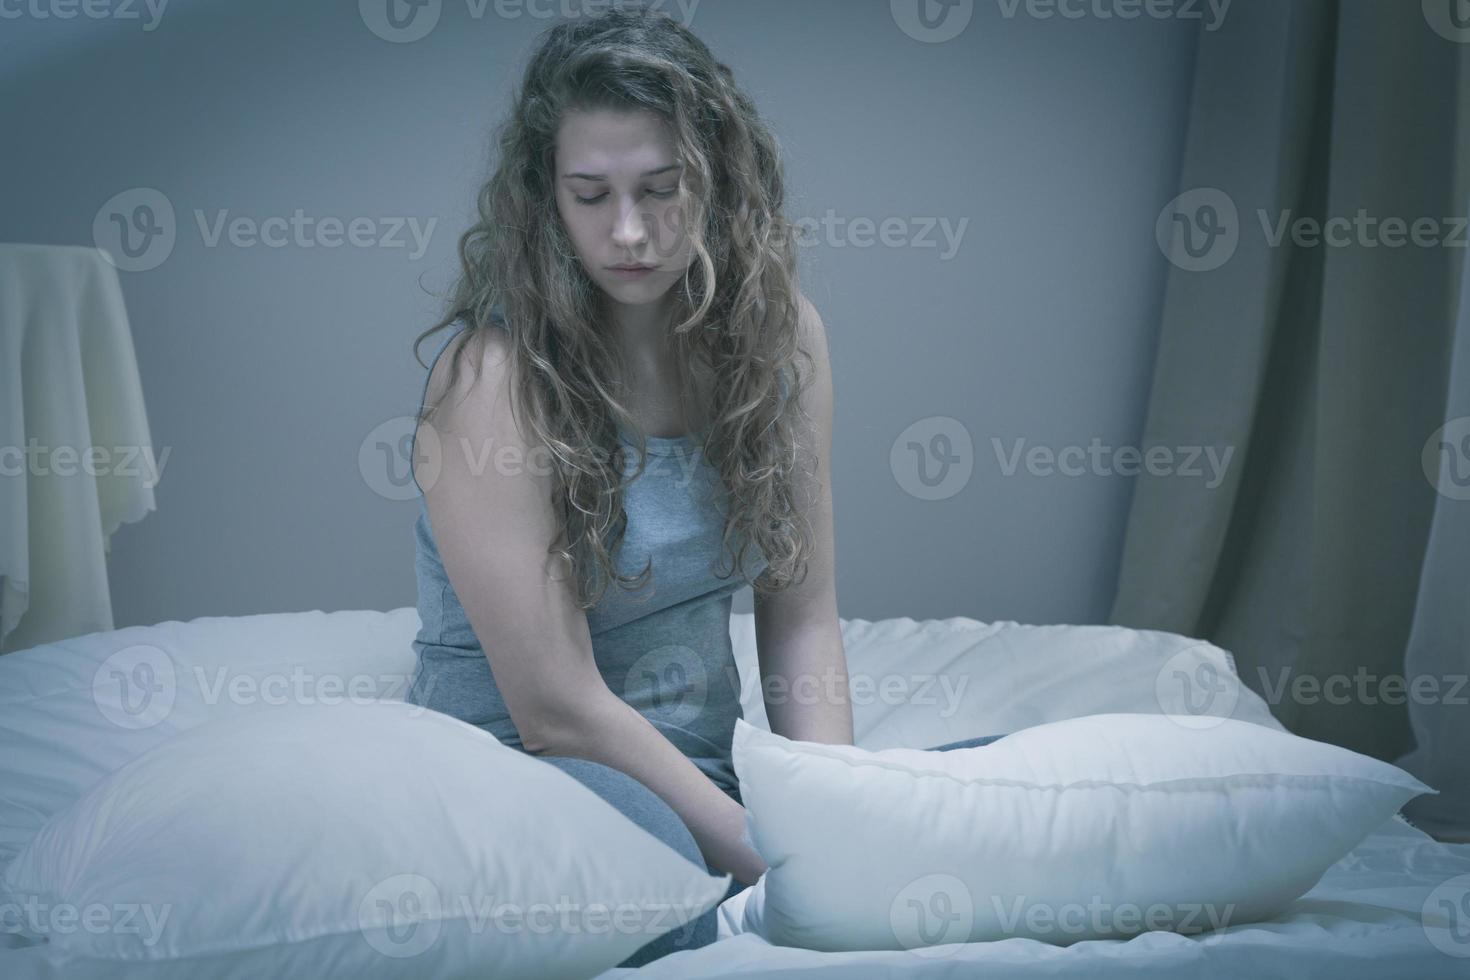 meisje met ernstige depressie foto